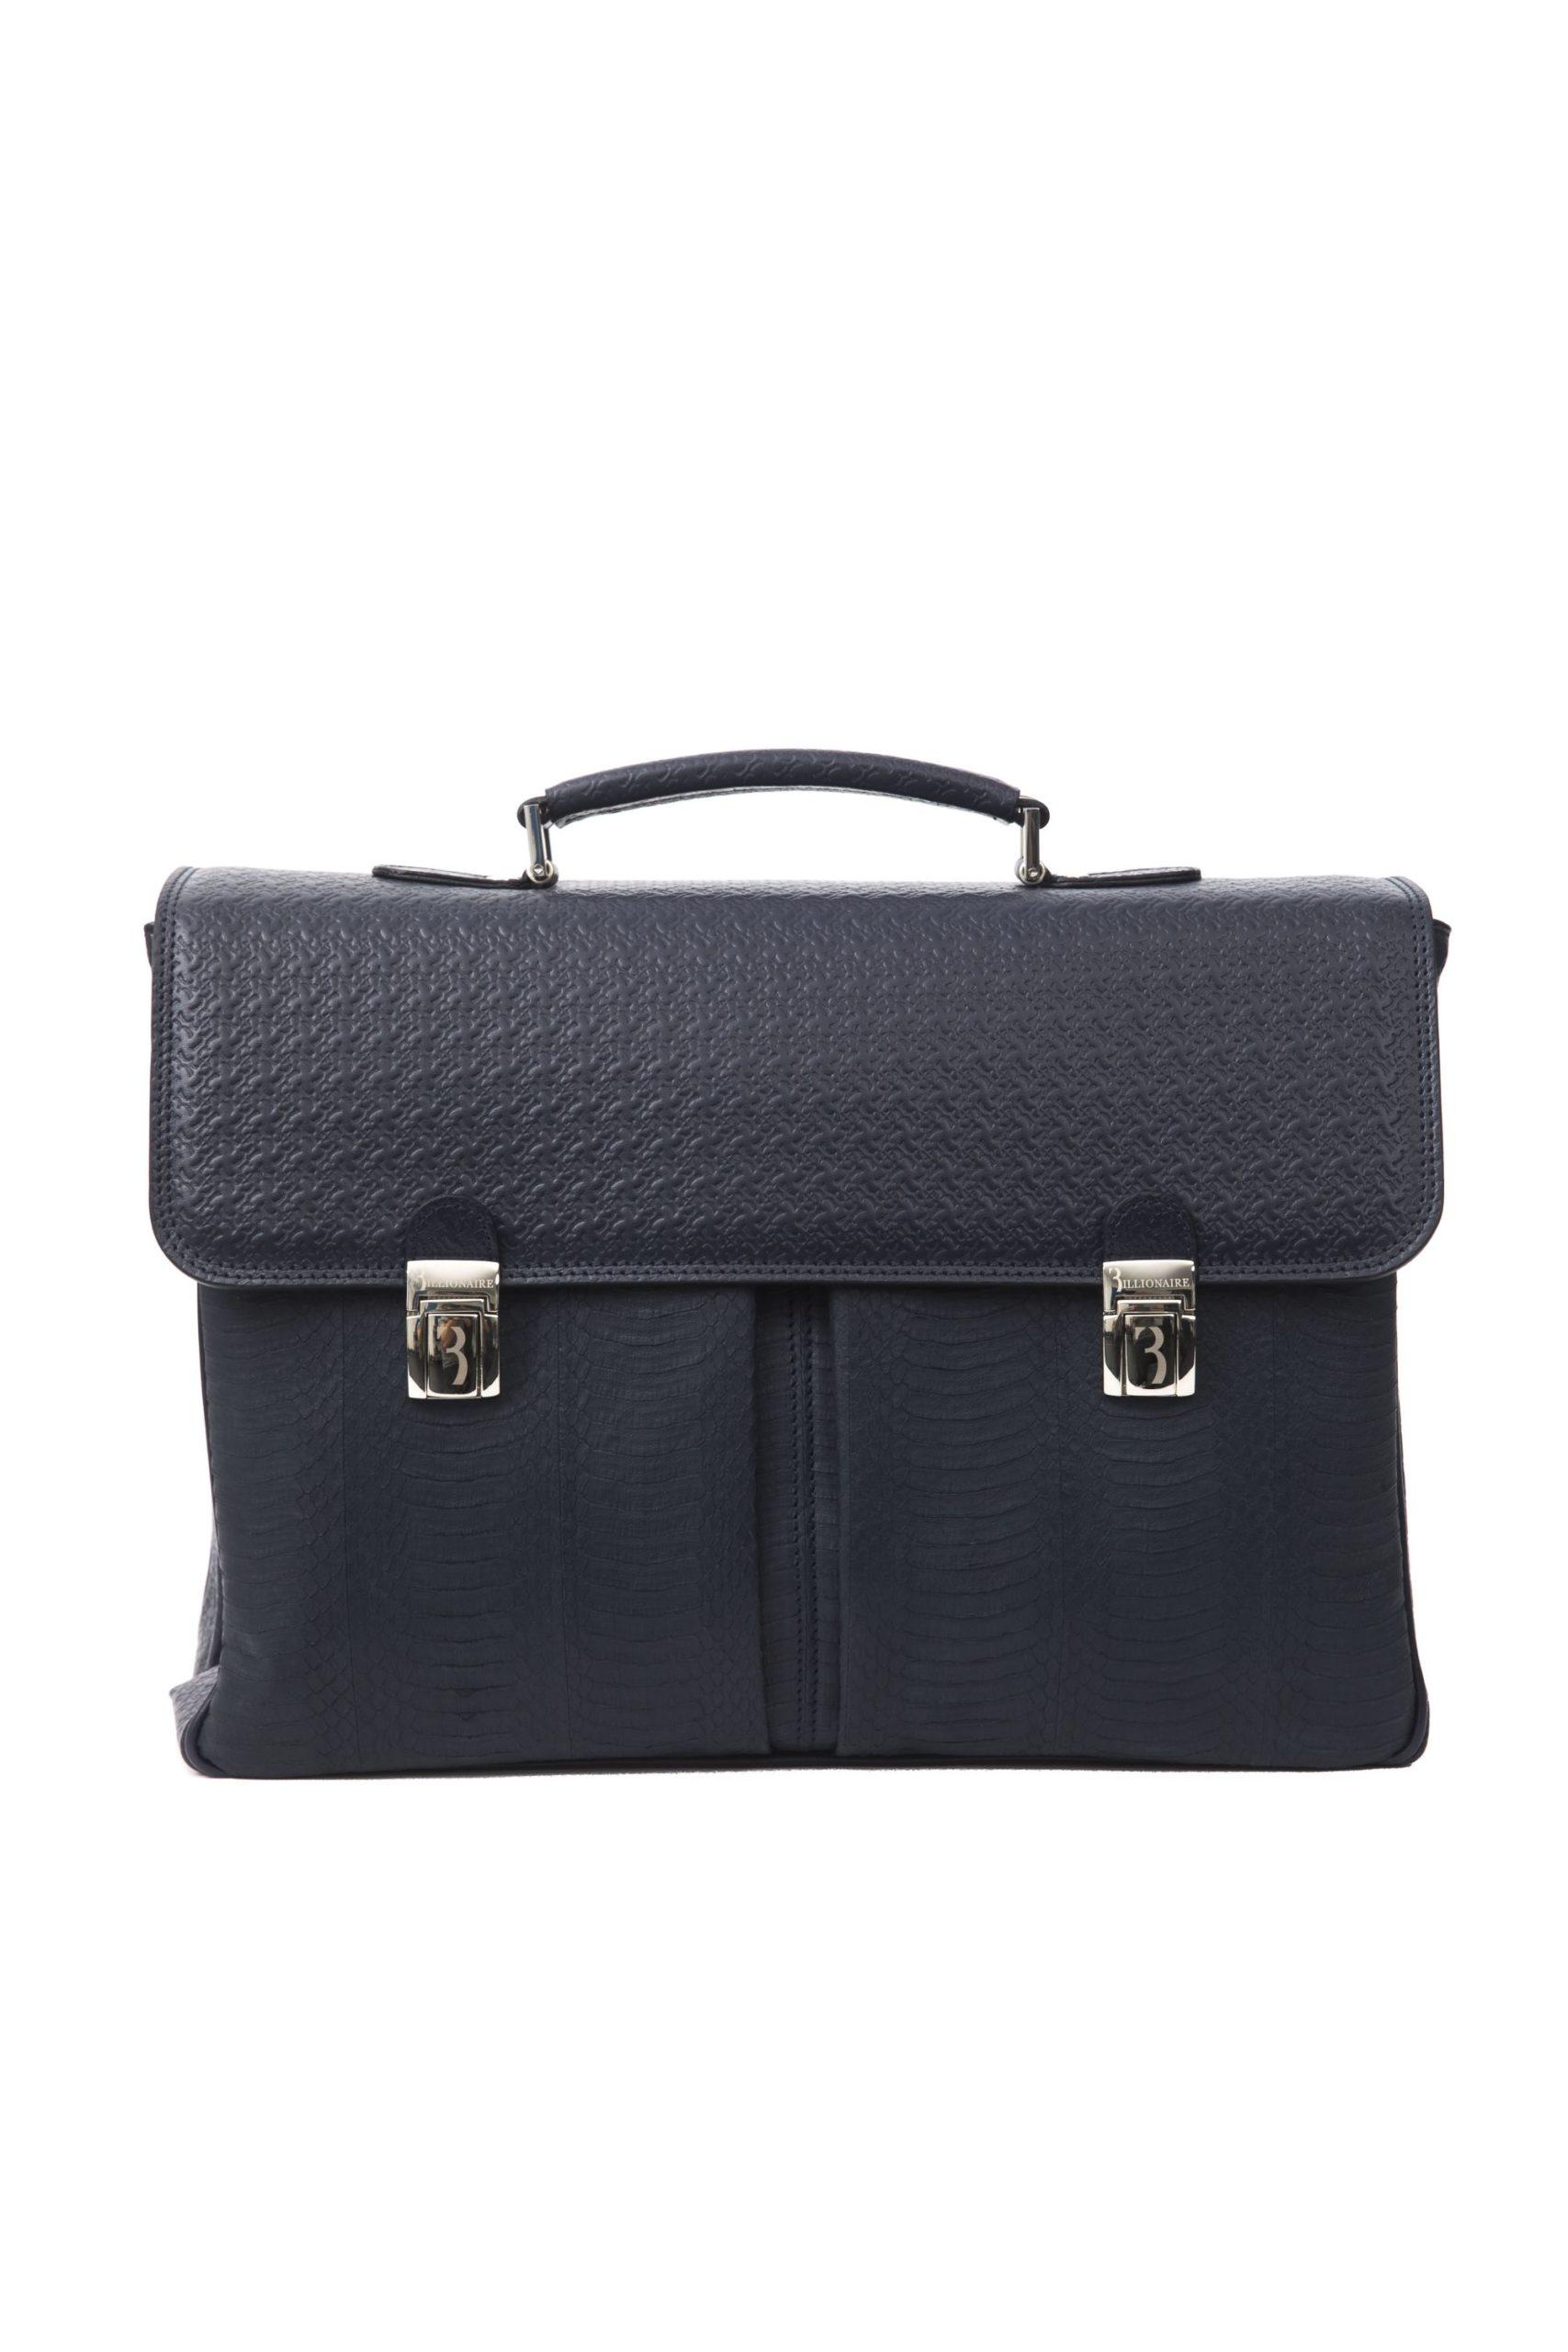 Billionaire Italian Couture Men's Briefcases Blue BI1267163